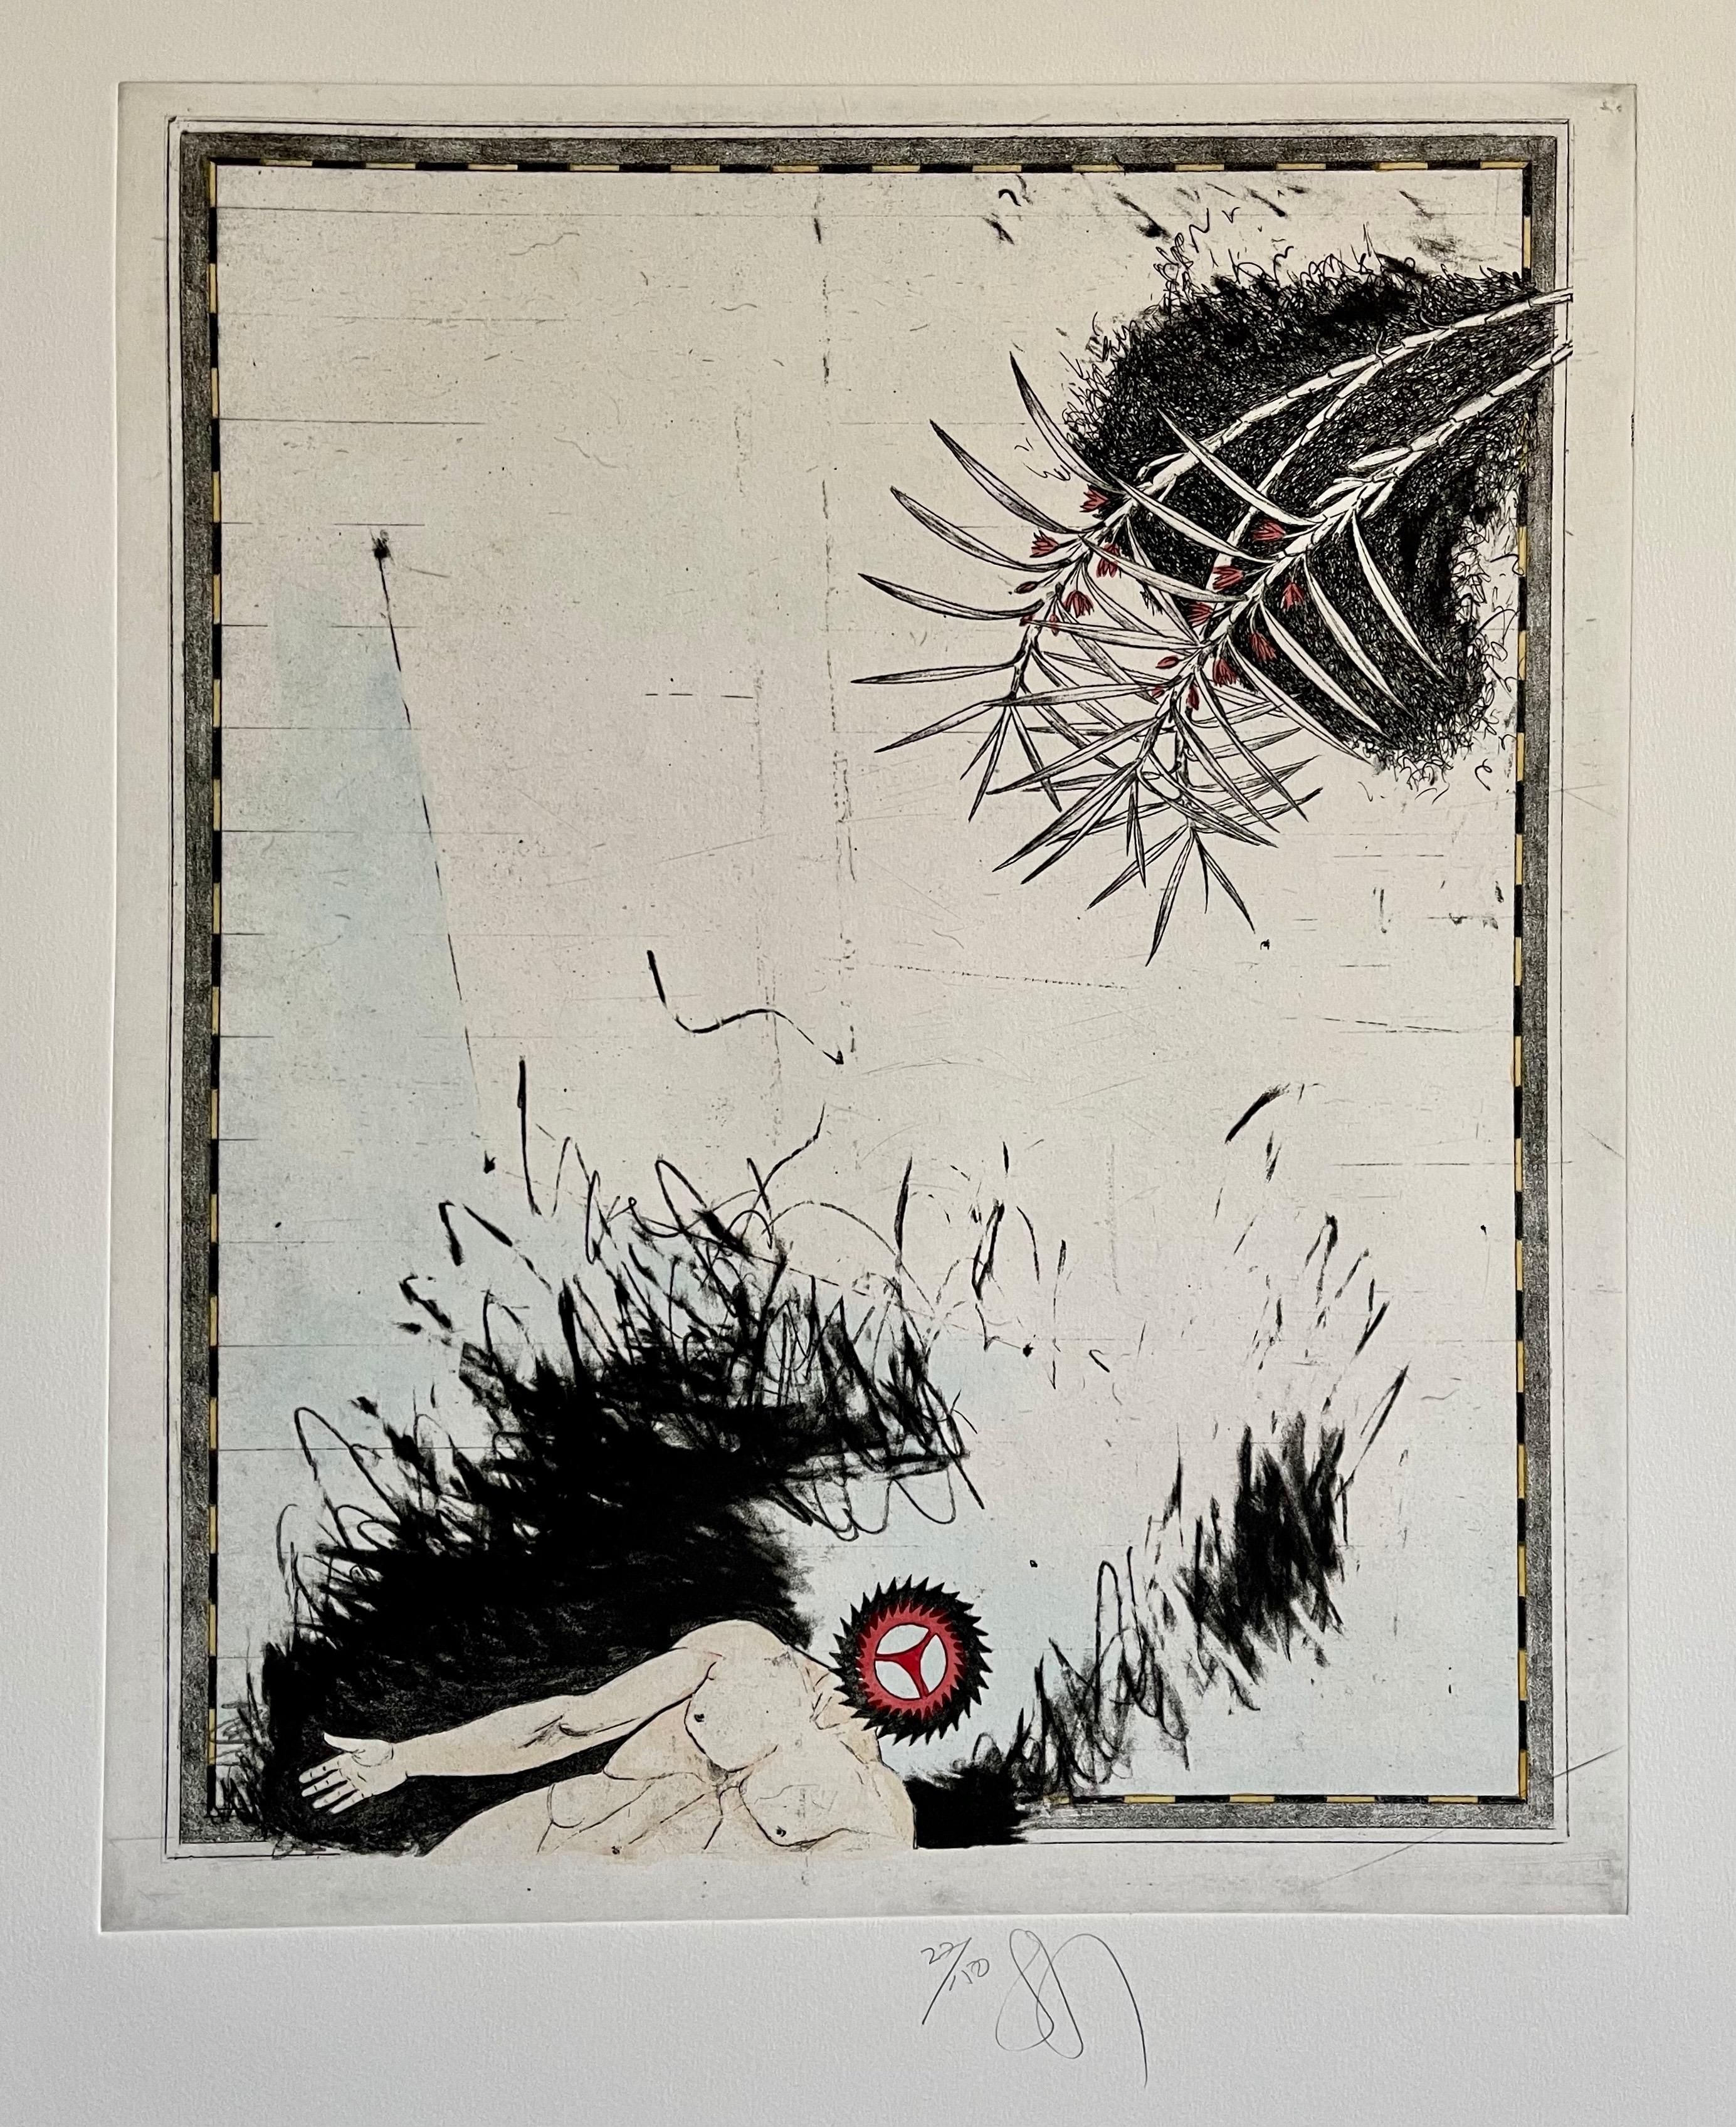 Large Donald Saff Surrealist Pop Art Aquatint Etching Action Figure Gearhead